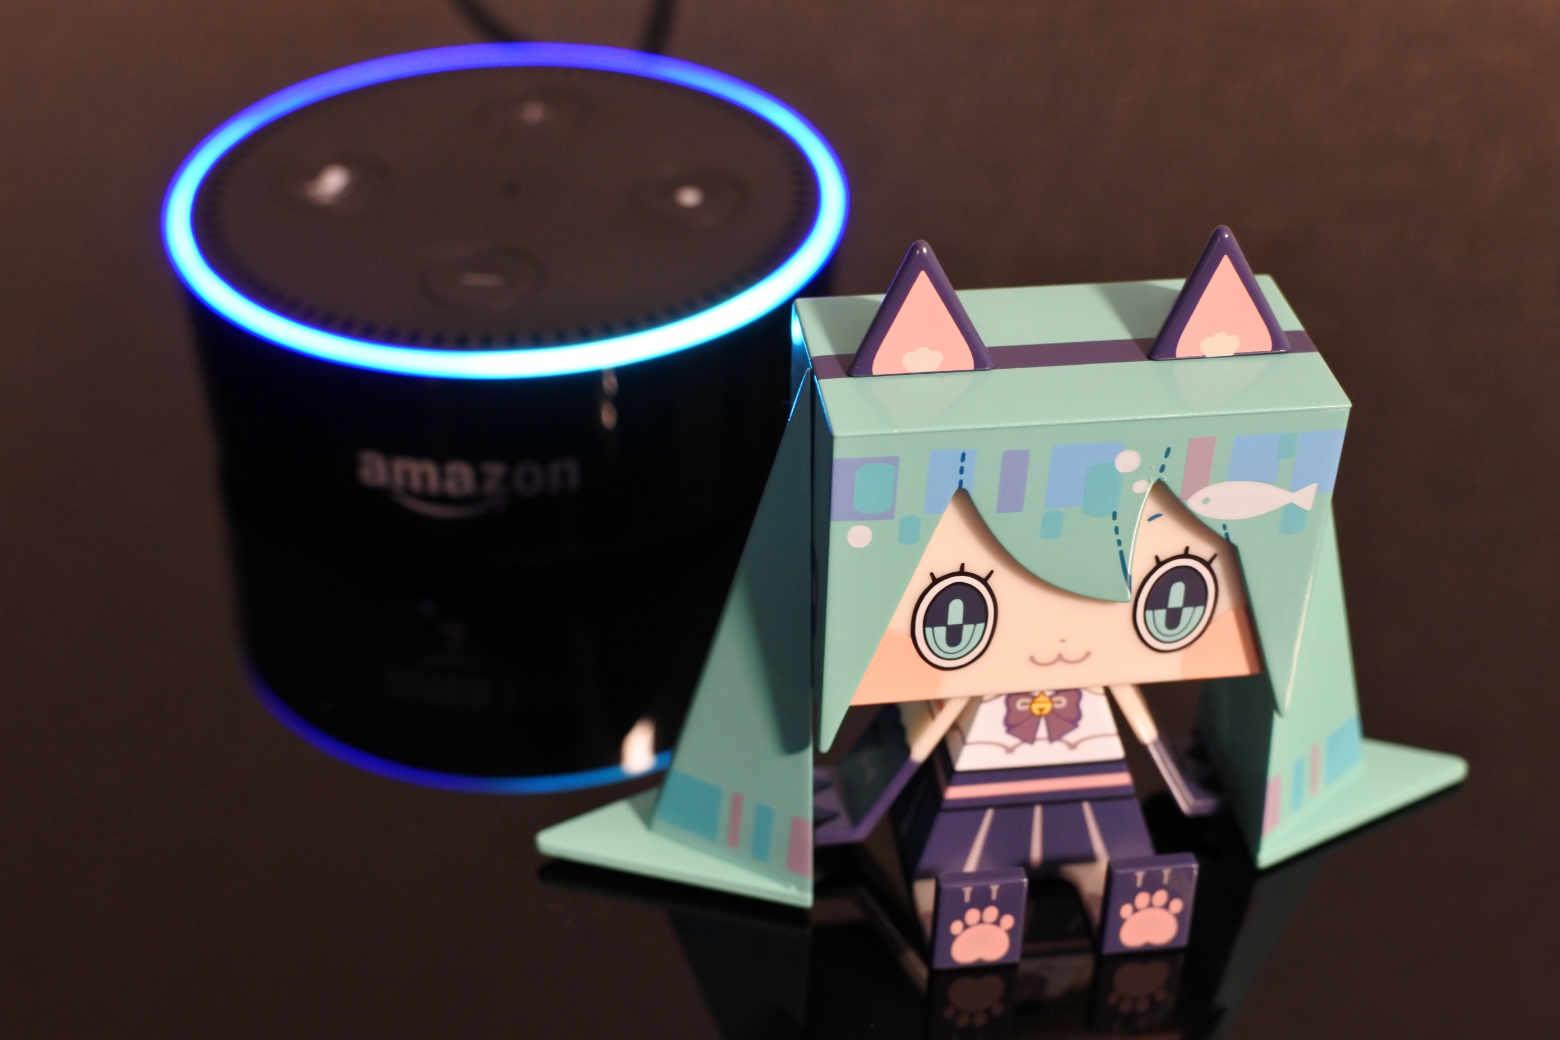 Hey MIKU!:初音ミクと会話ができるAmazon Echo Dotを購入しました【レビュー】